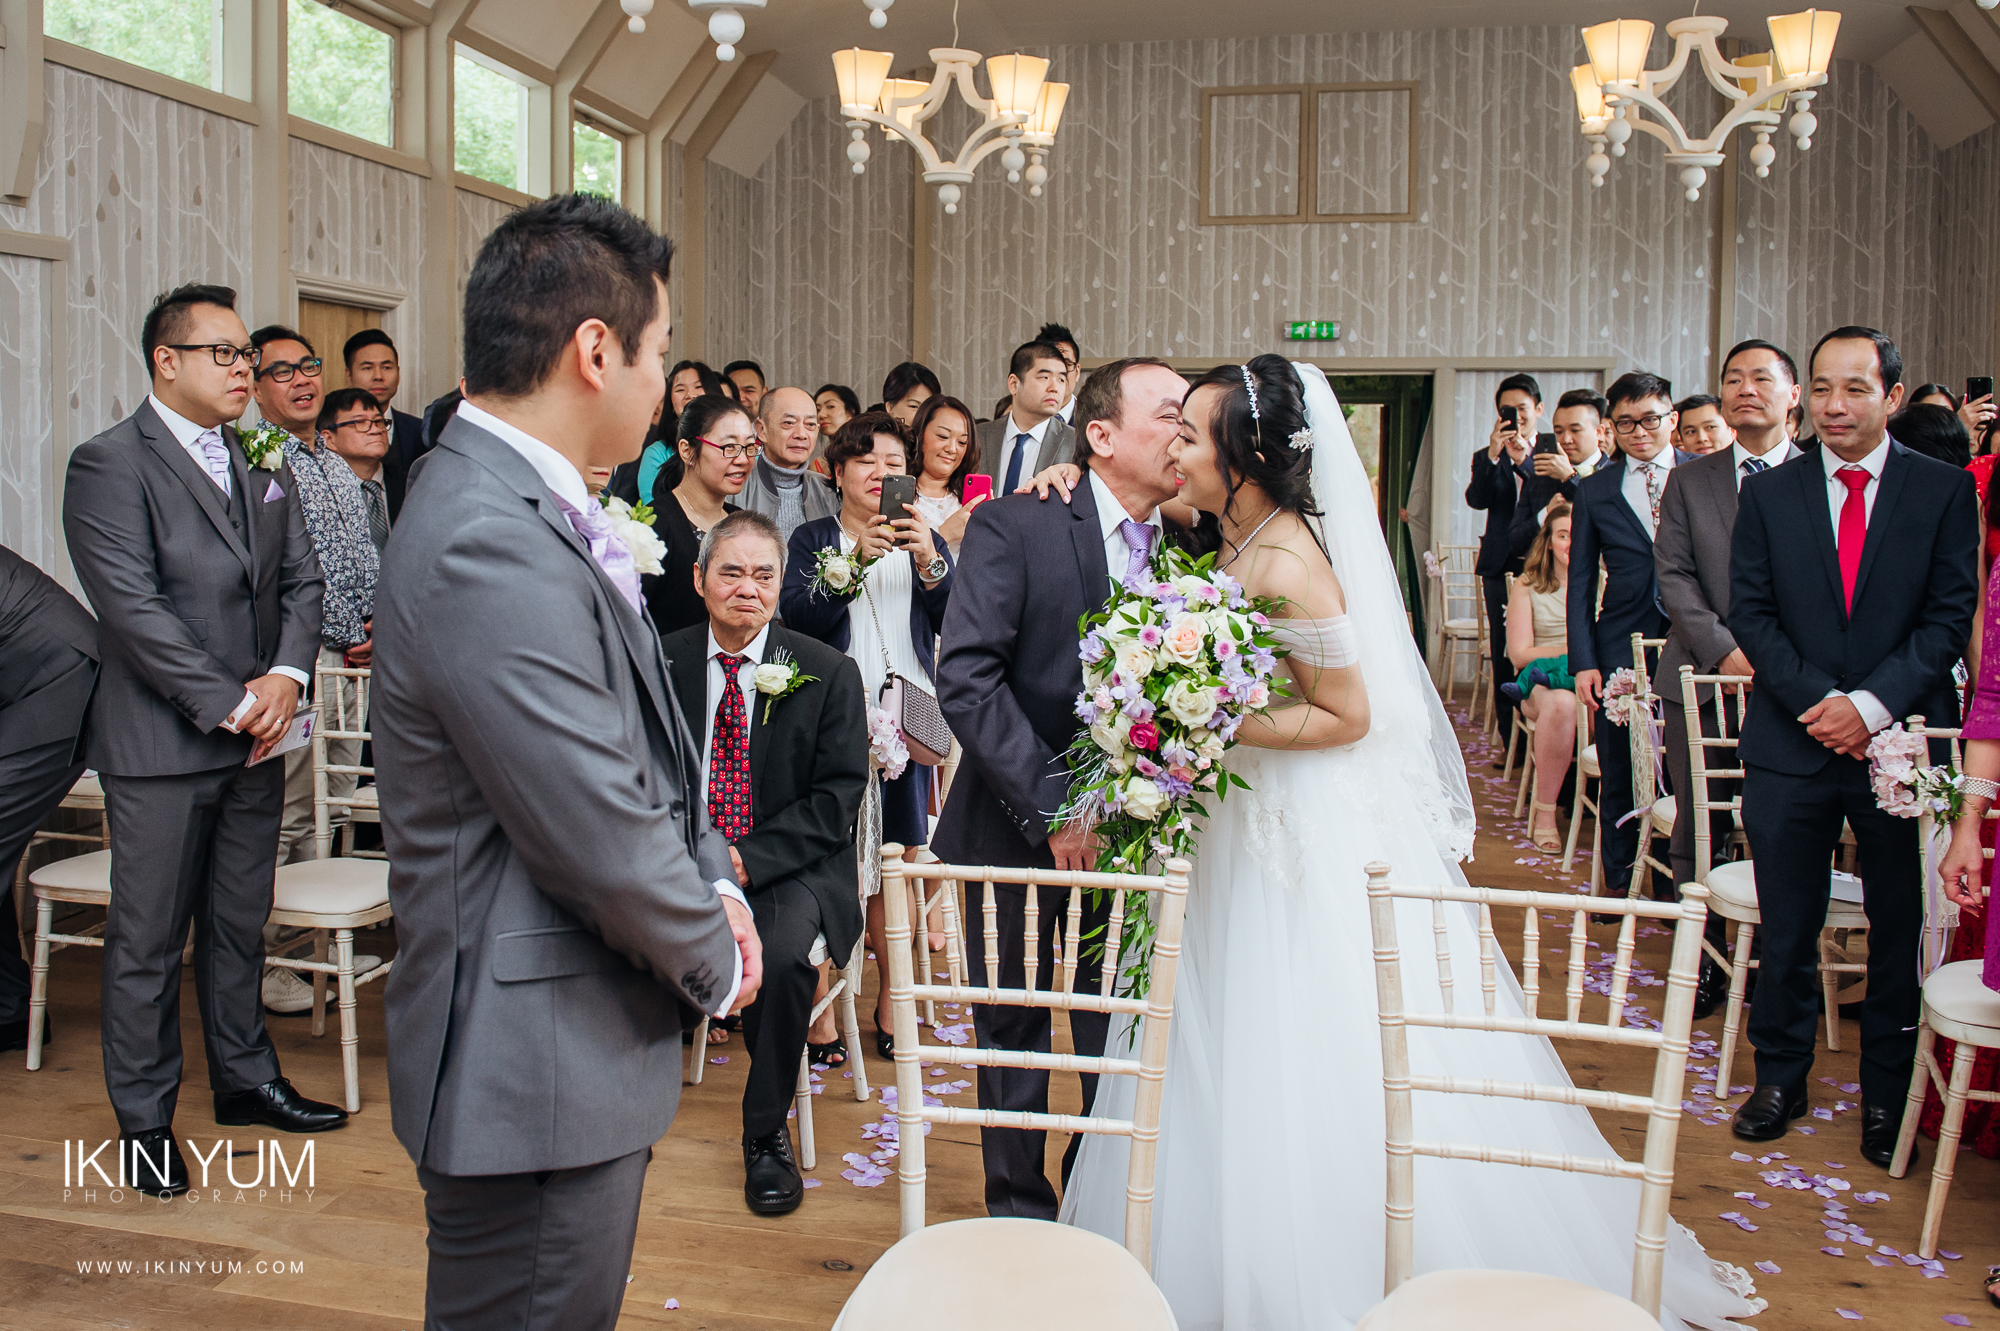 Hampton Manor Wedding - Ikin Yum Photography -072.jpg